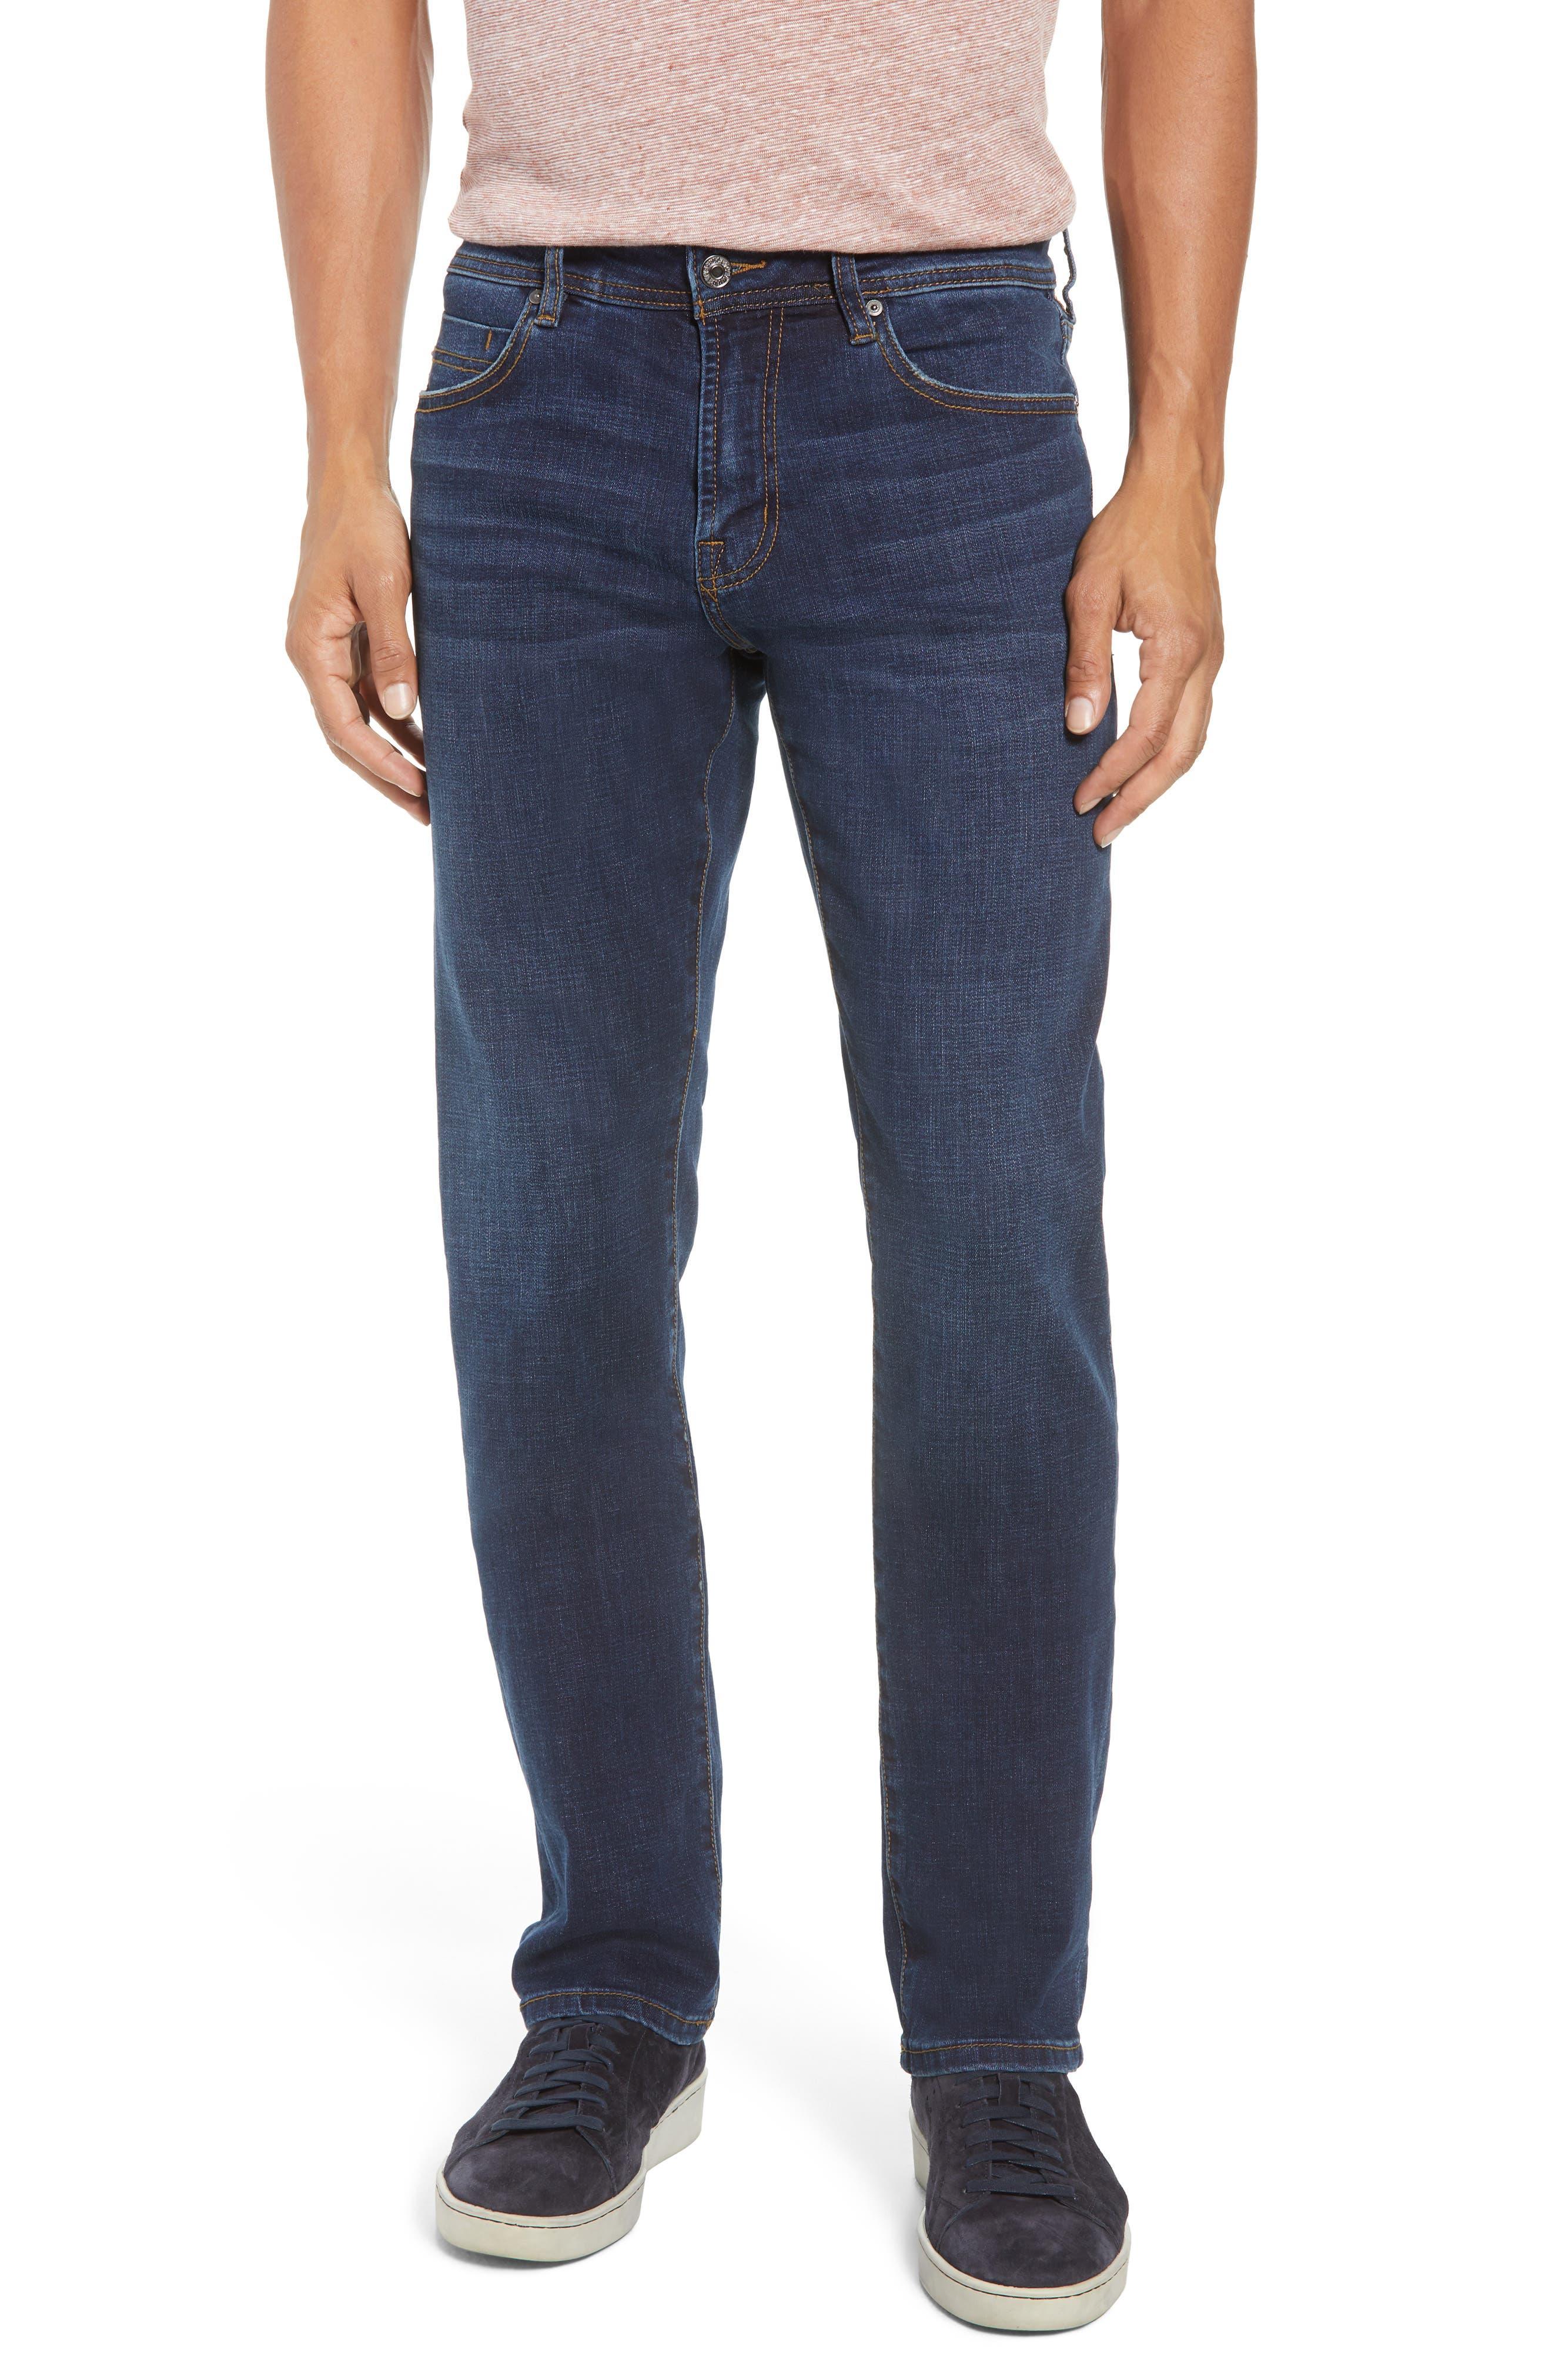 Relaxed Fit Jeans,                             Main thumbnail 1, color,                             Navajo Dark